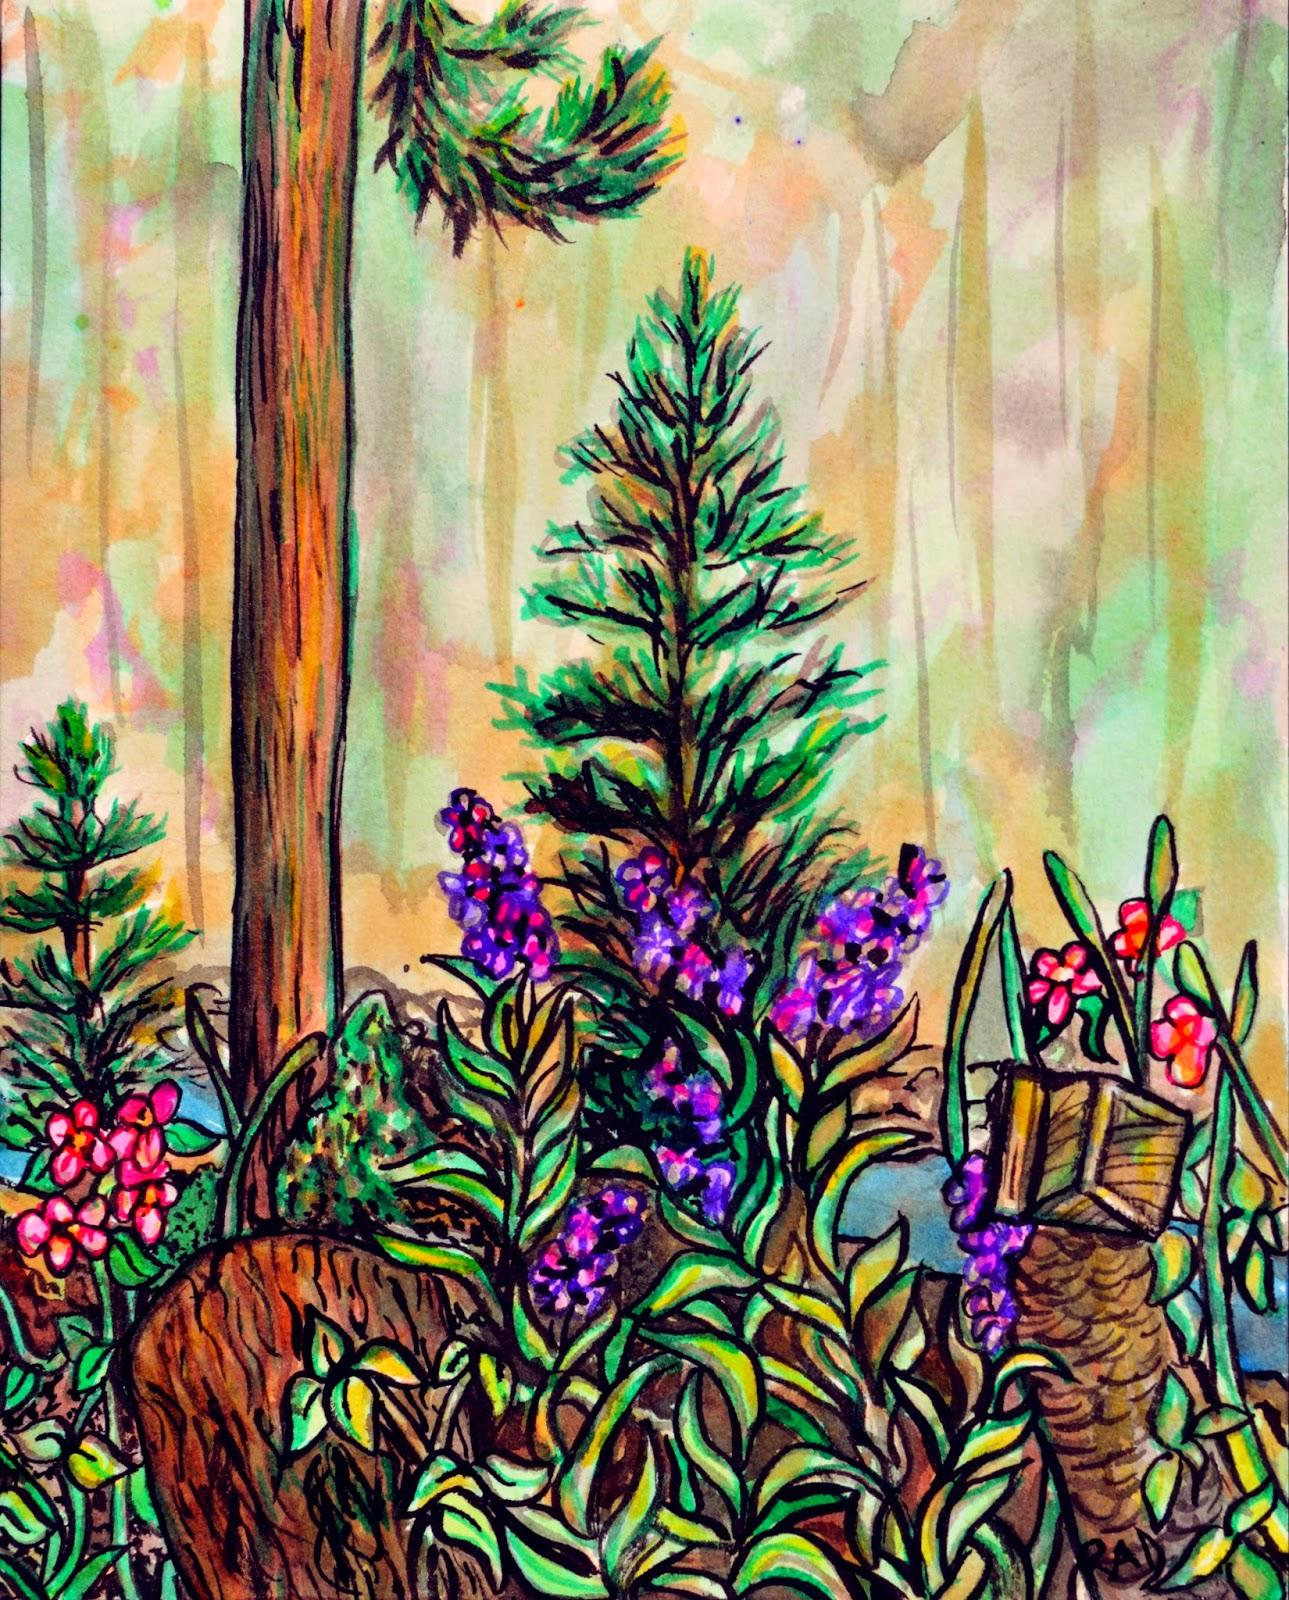 https://www.etsy.com/listing/196381779/original-ink-forest-painting-cabin-plein